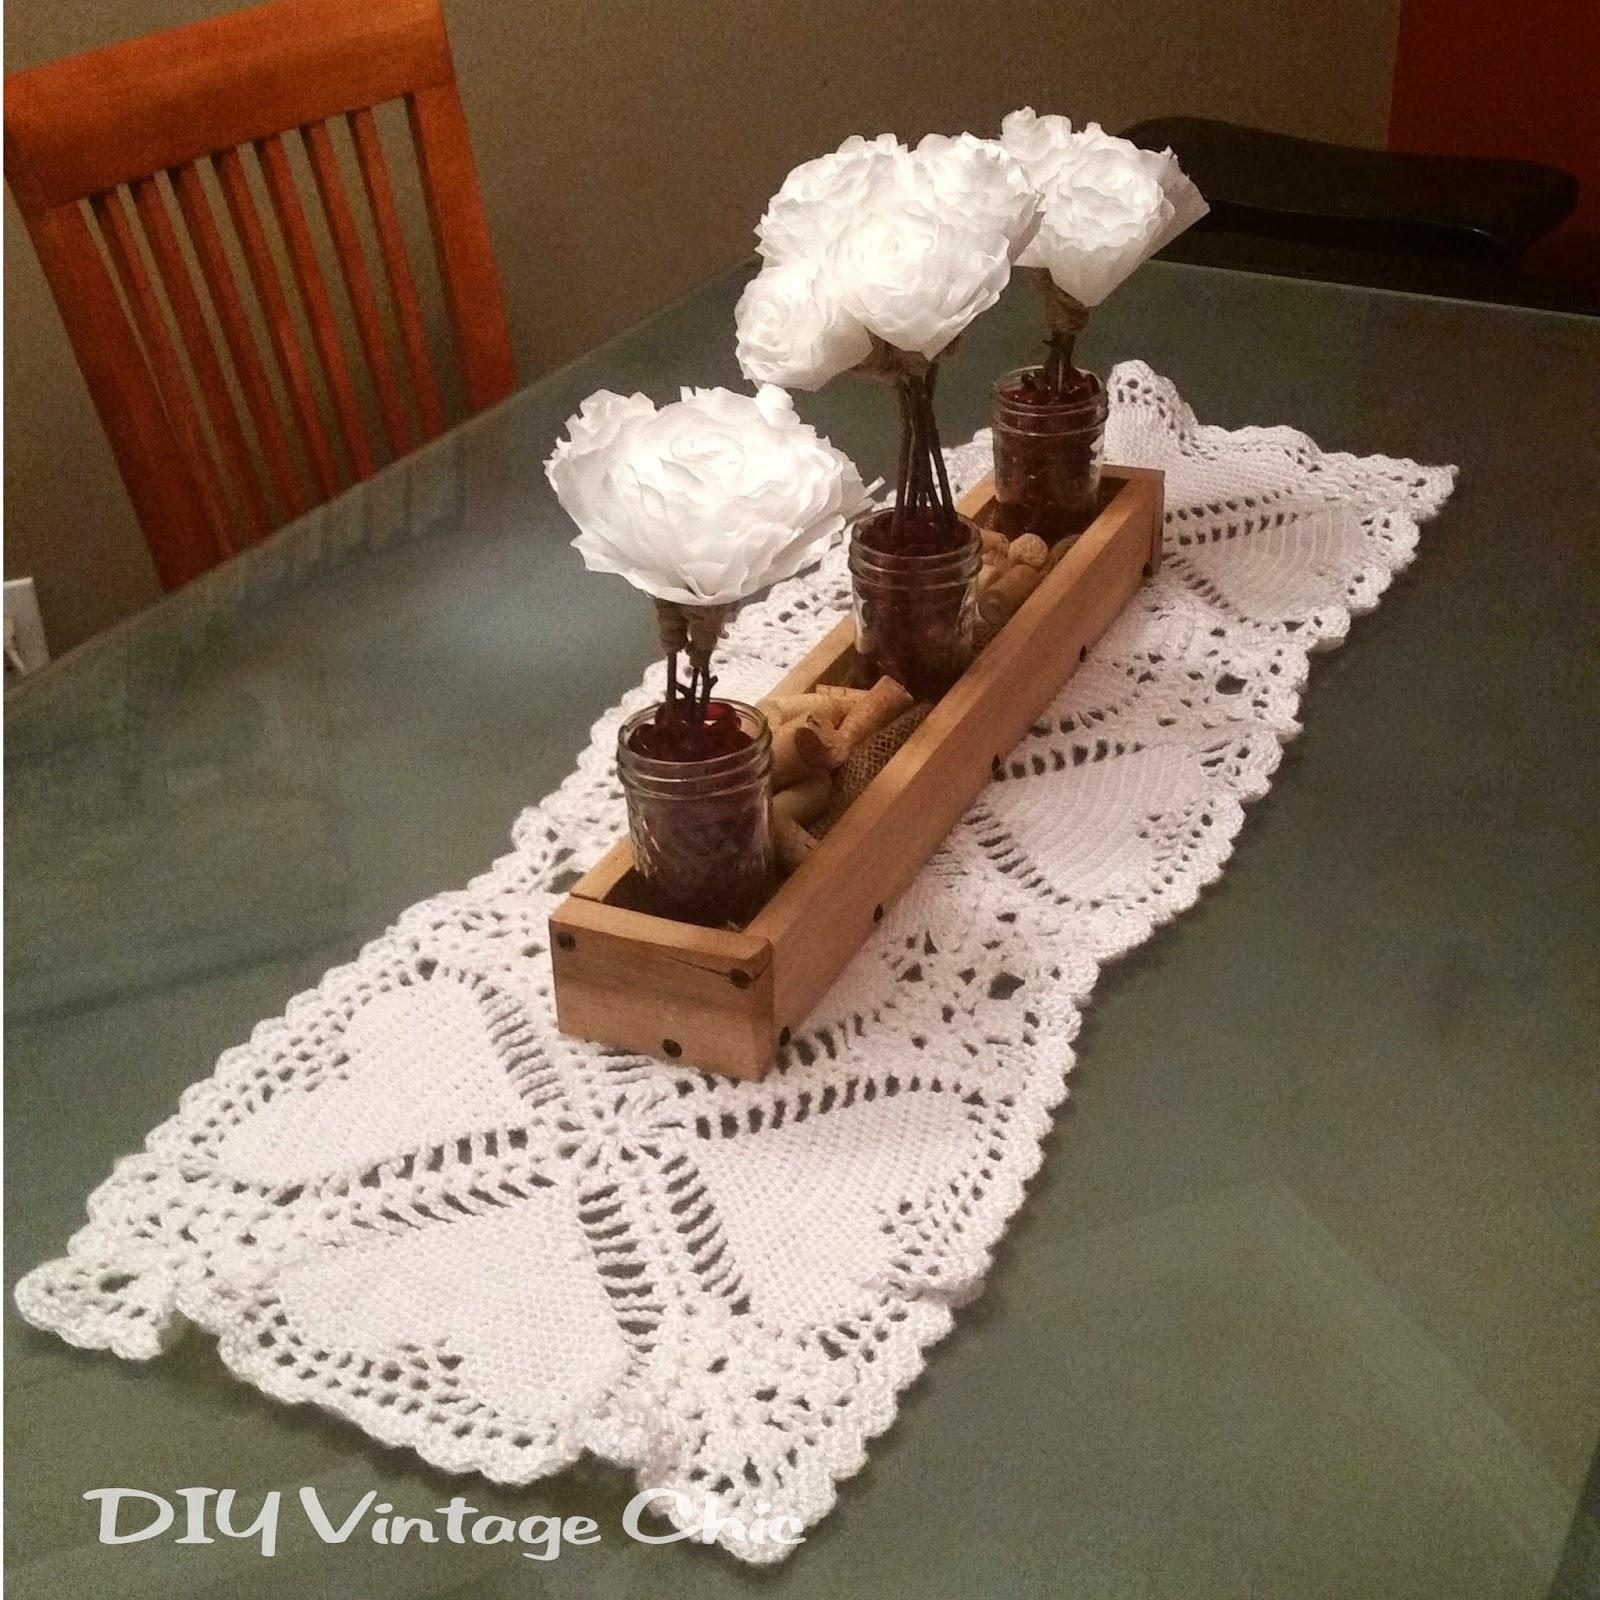 Diy Vintage Chic Crochet Valentine S Day Table Runner